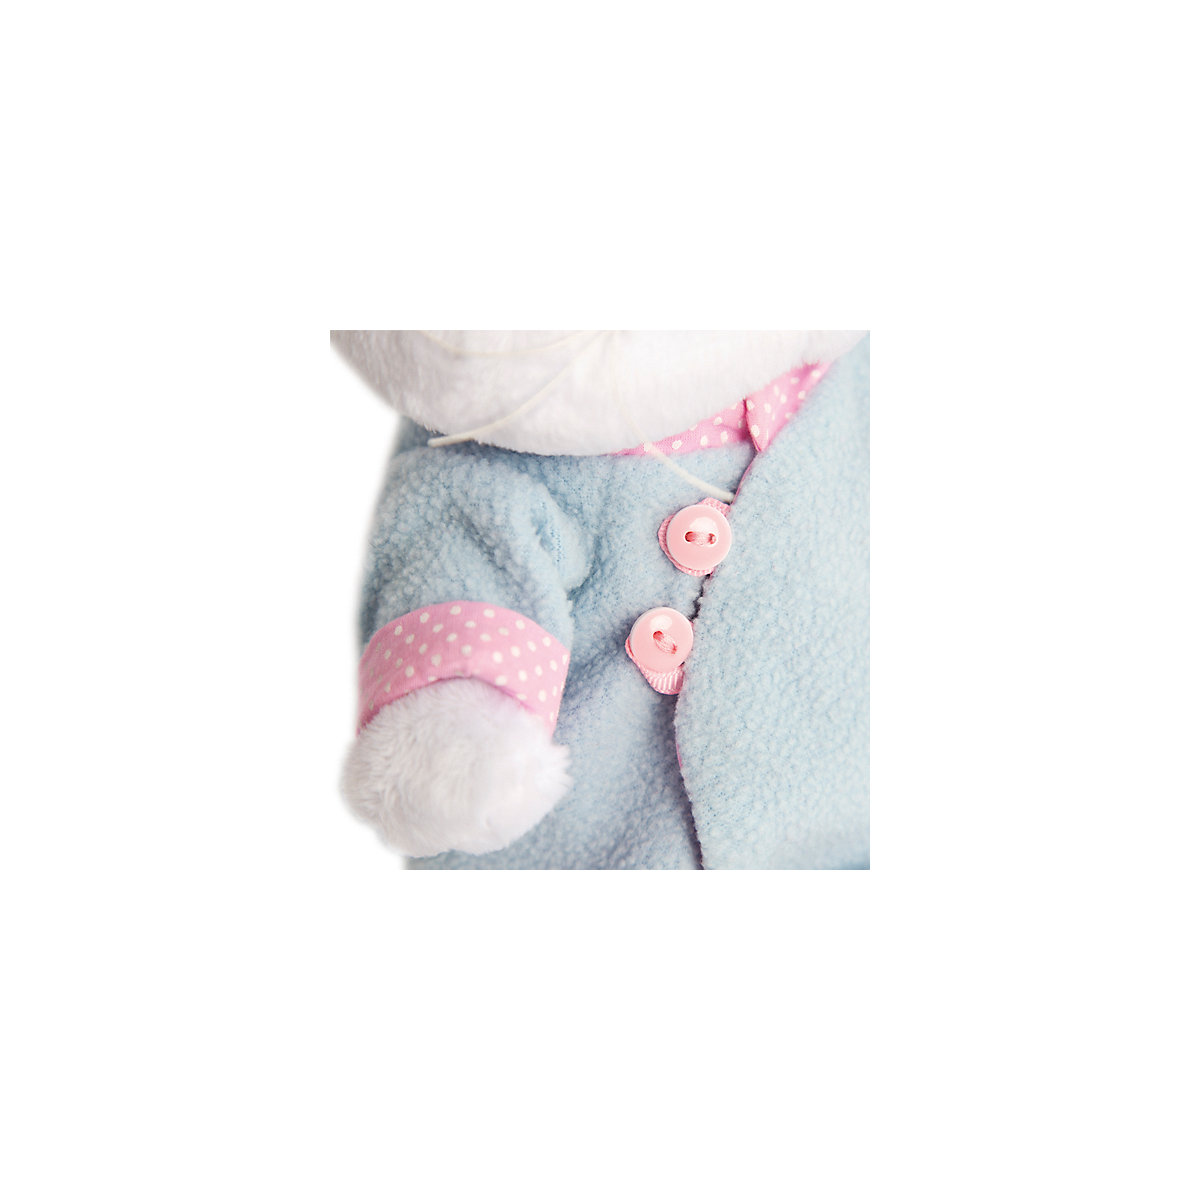 Gevulde & Pluche Dieren BUDI BASA 8999611 Stitch Beer Totoro Giraffe Fox Kat Hond Zachte Kinderen \'s speelgoed MTpromo - 4